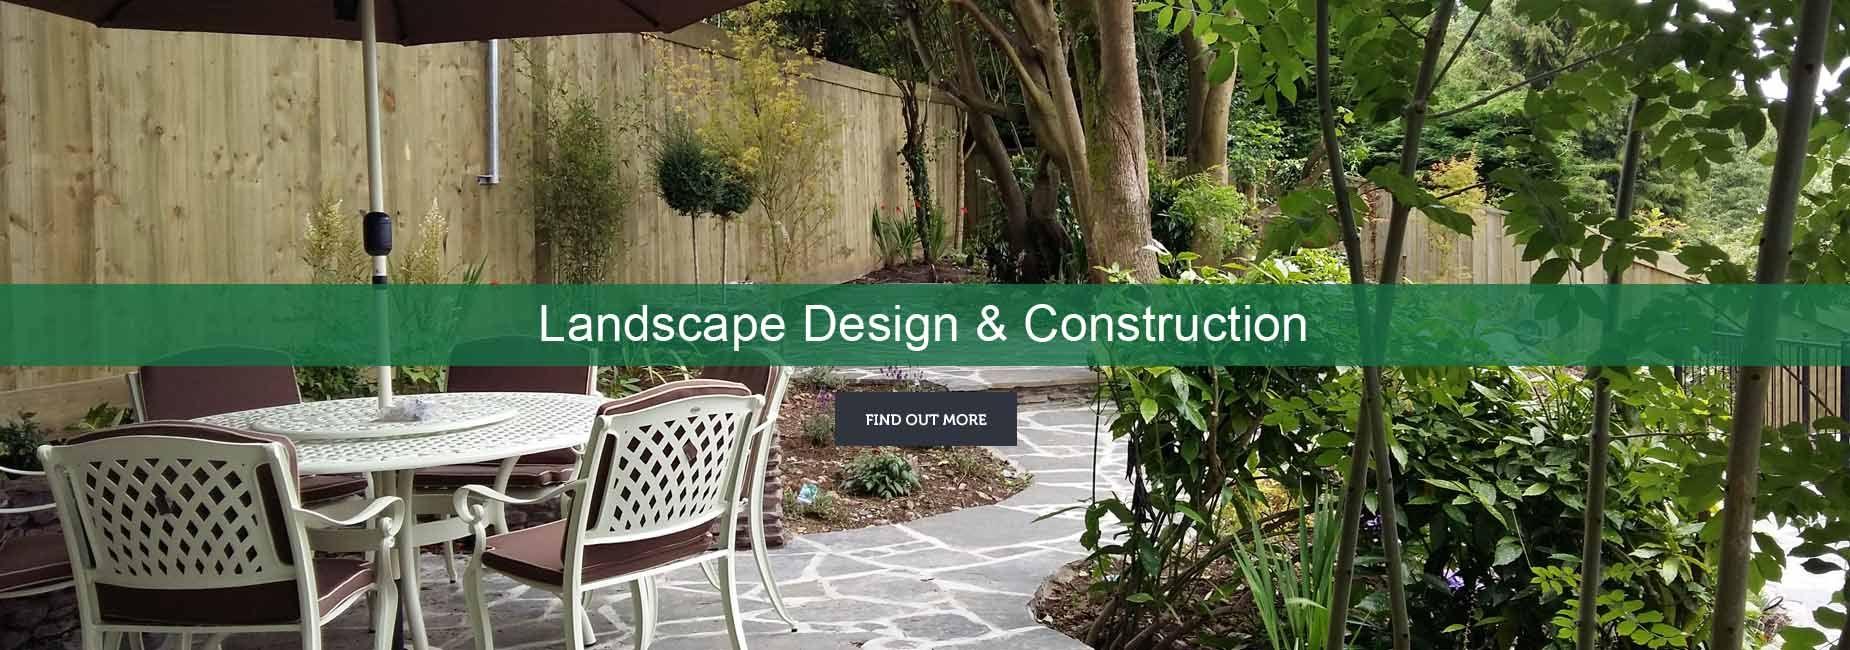 Landscape Gardeners Cork Landscaping Garden Designs Garden Design Landscape Design Garden Landscaping